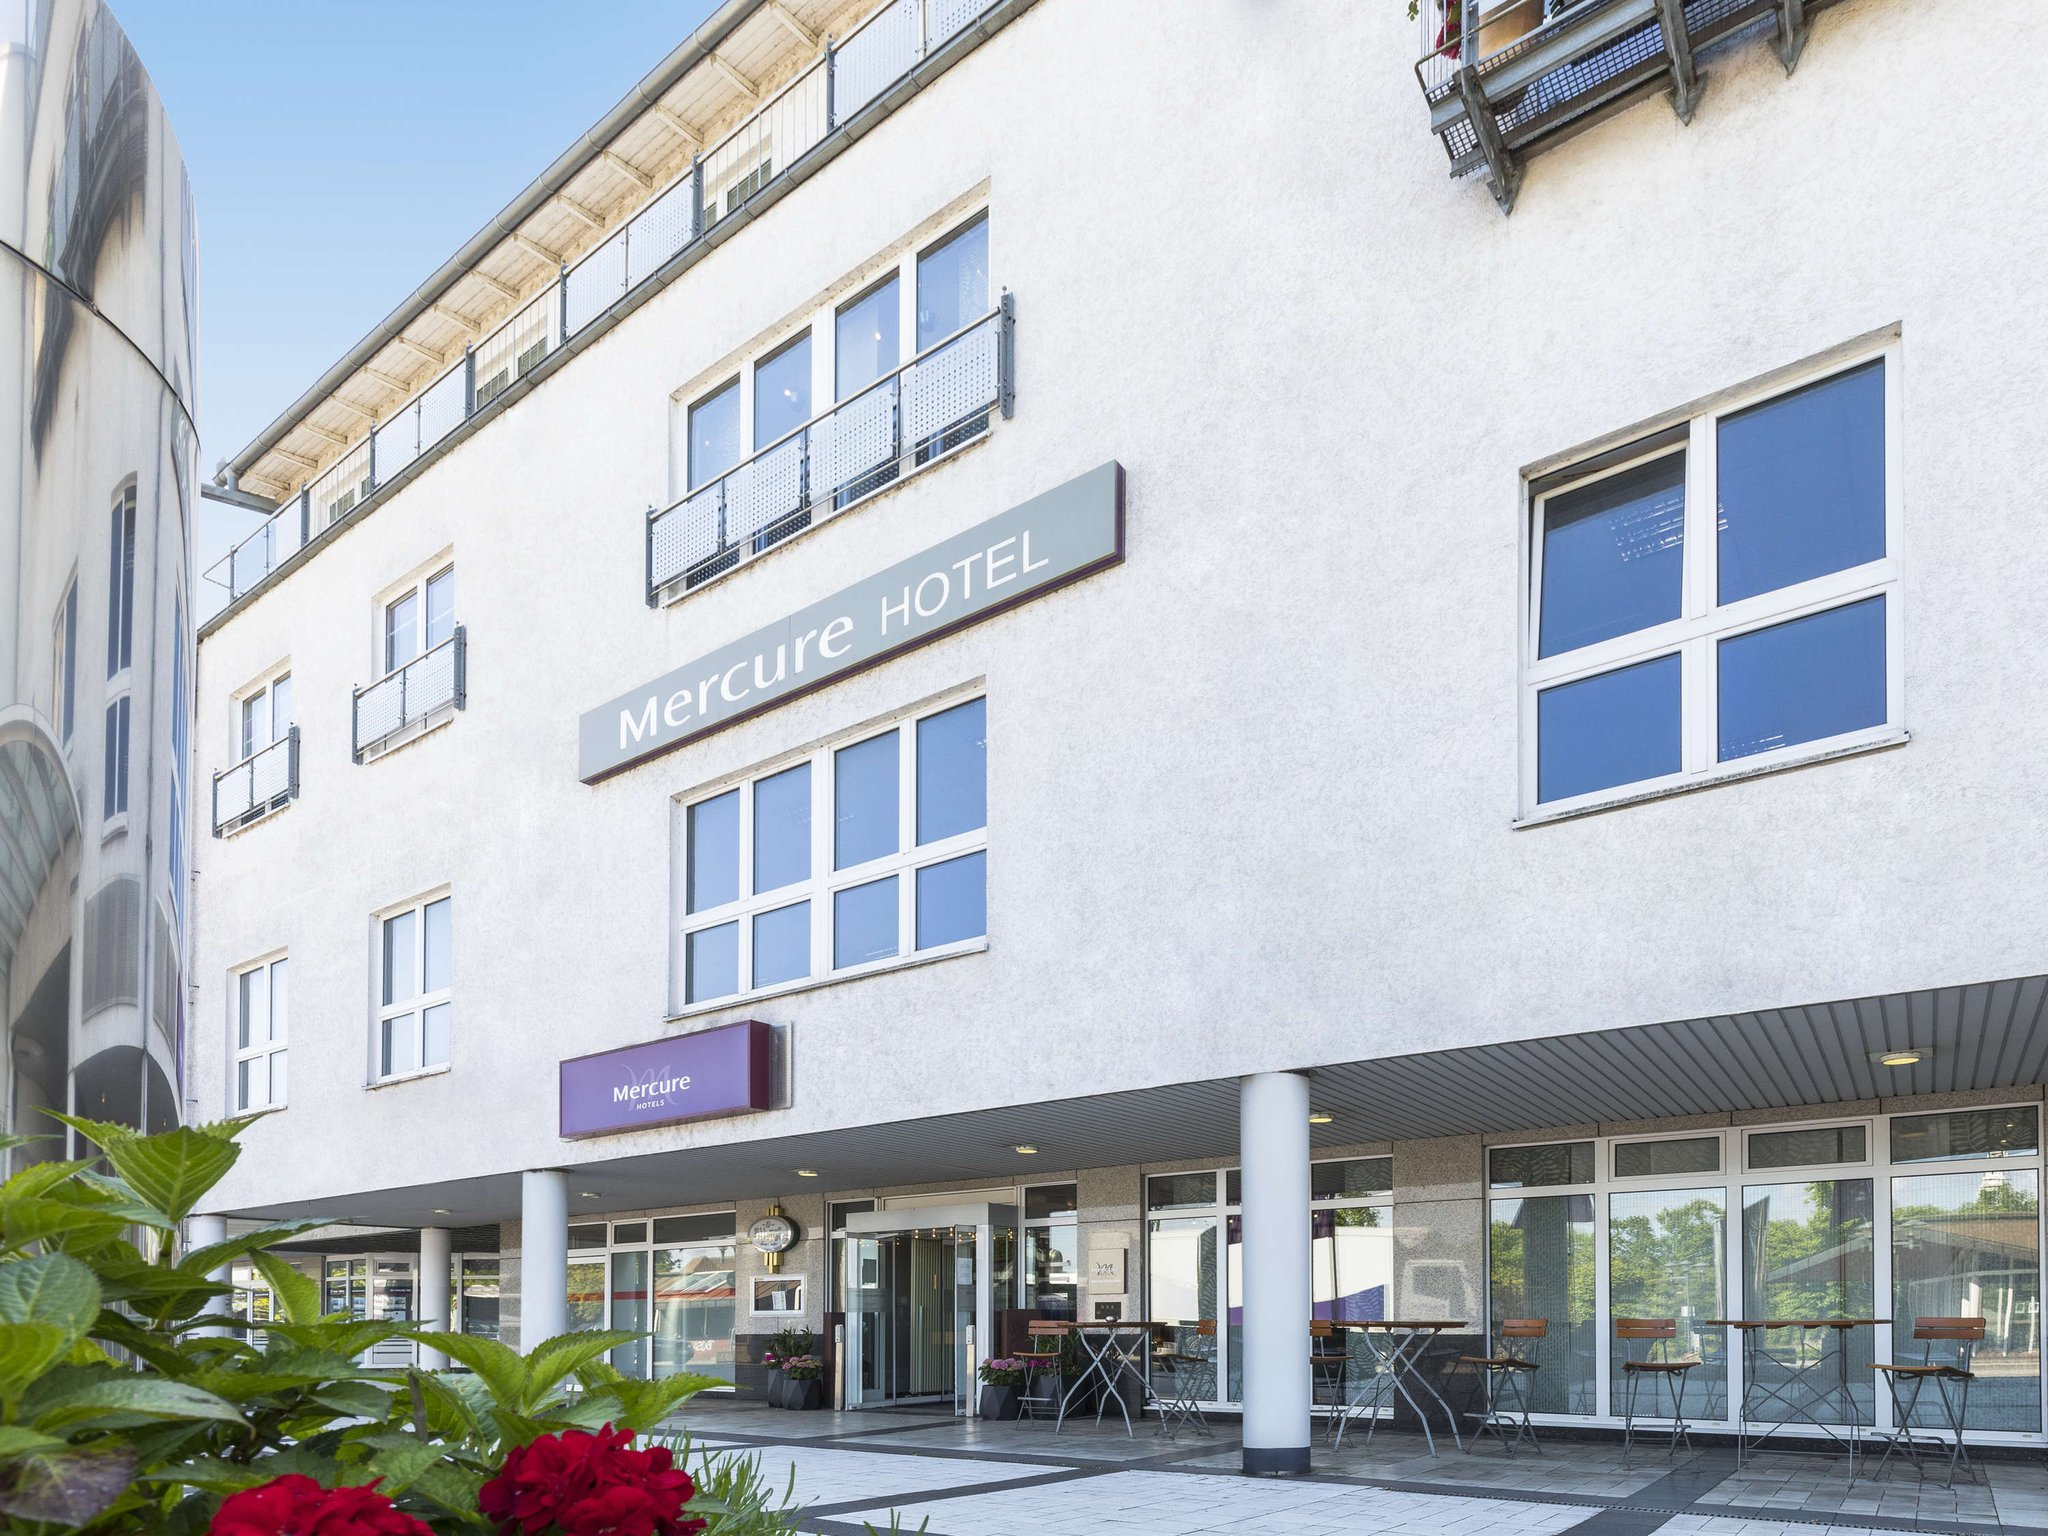 Mercure Bad Oeynhausen